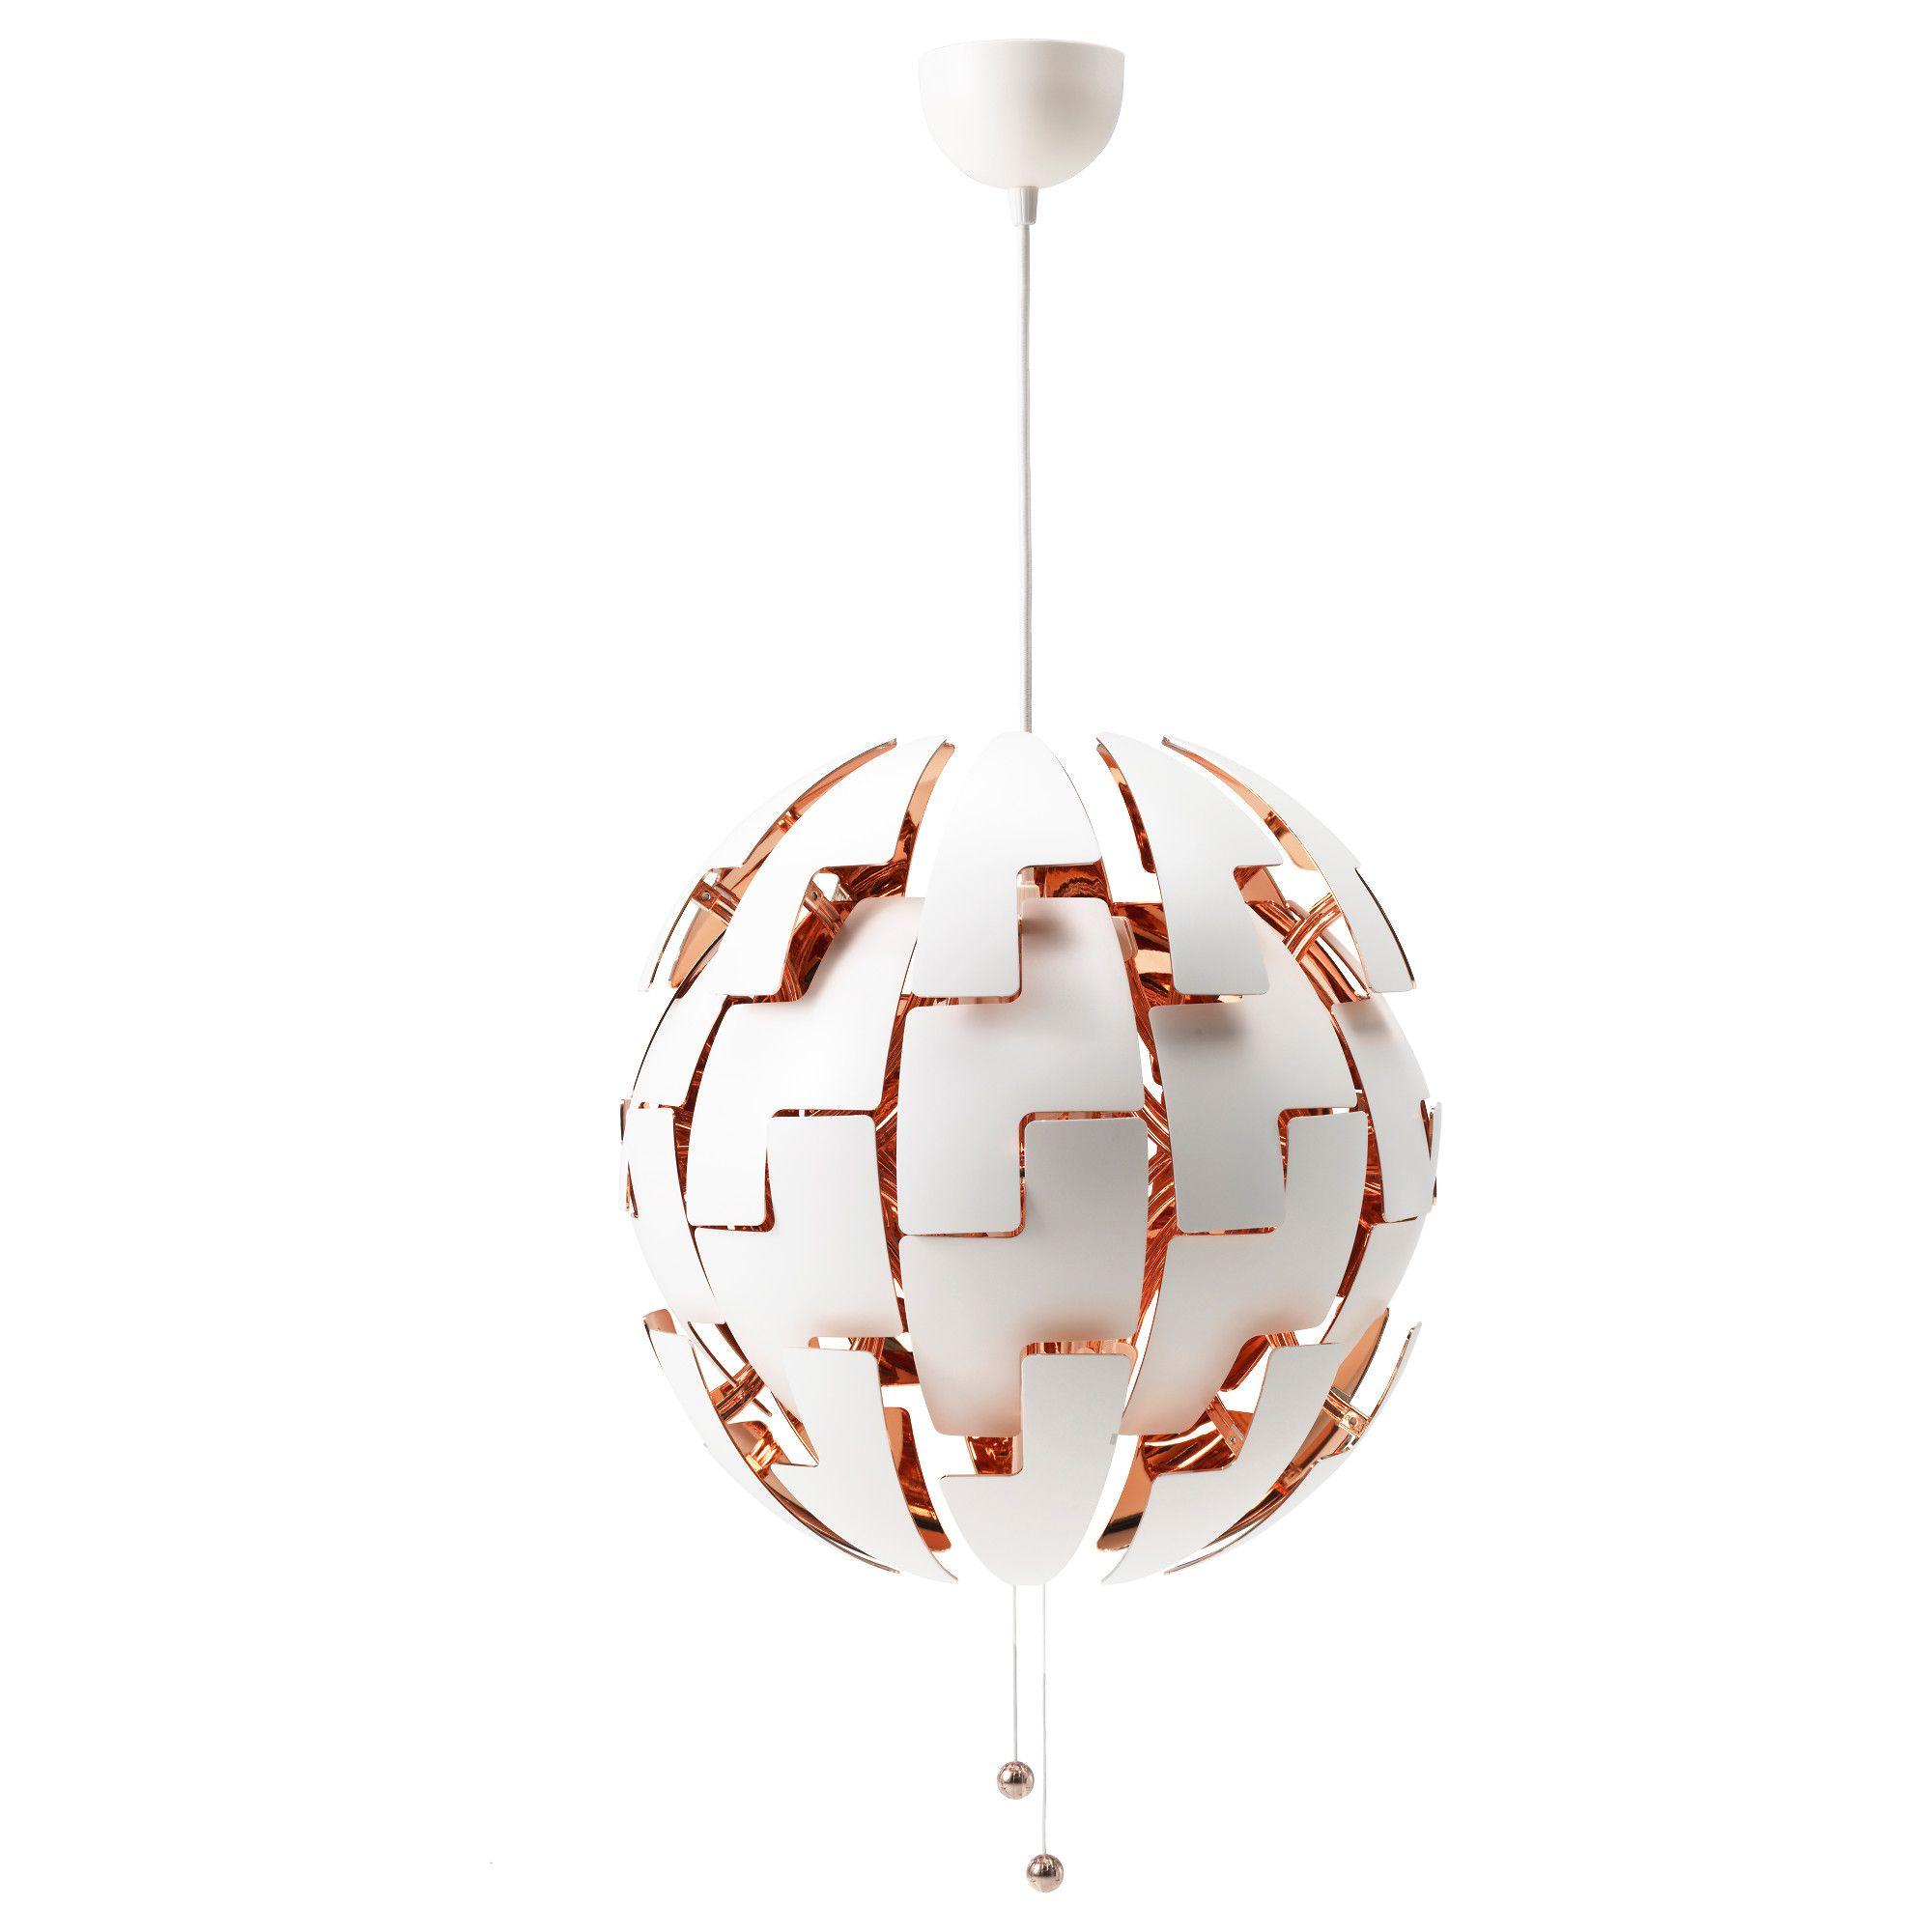 ikea ps 2014 lampe smartstore. Black Bedroom Furniture Sets. Home Design Ideas